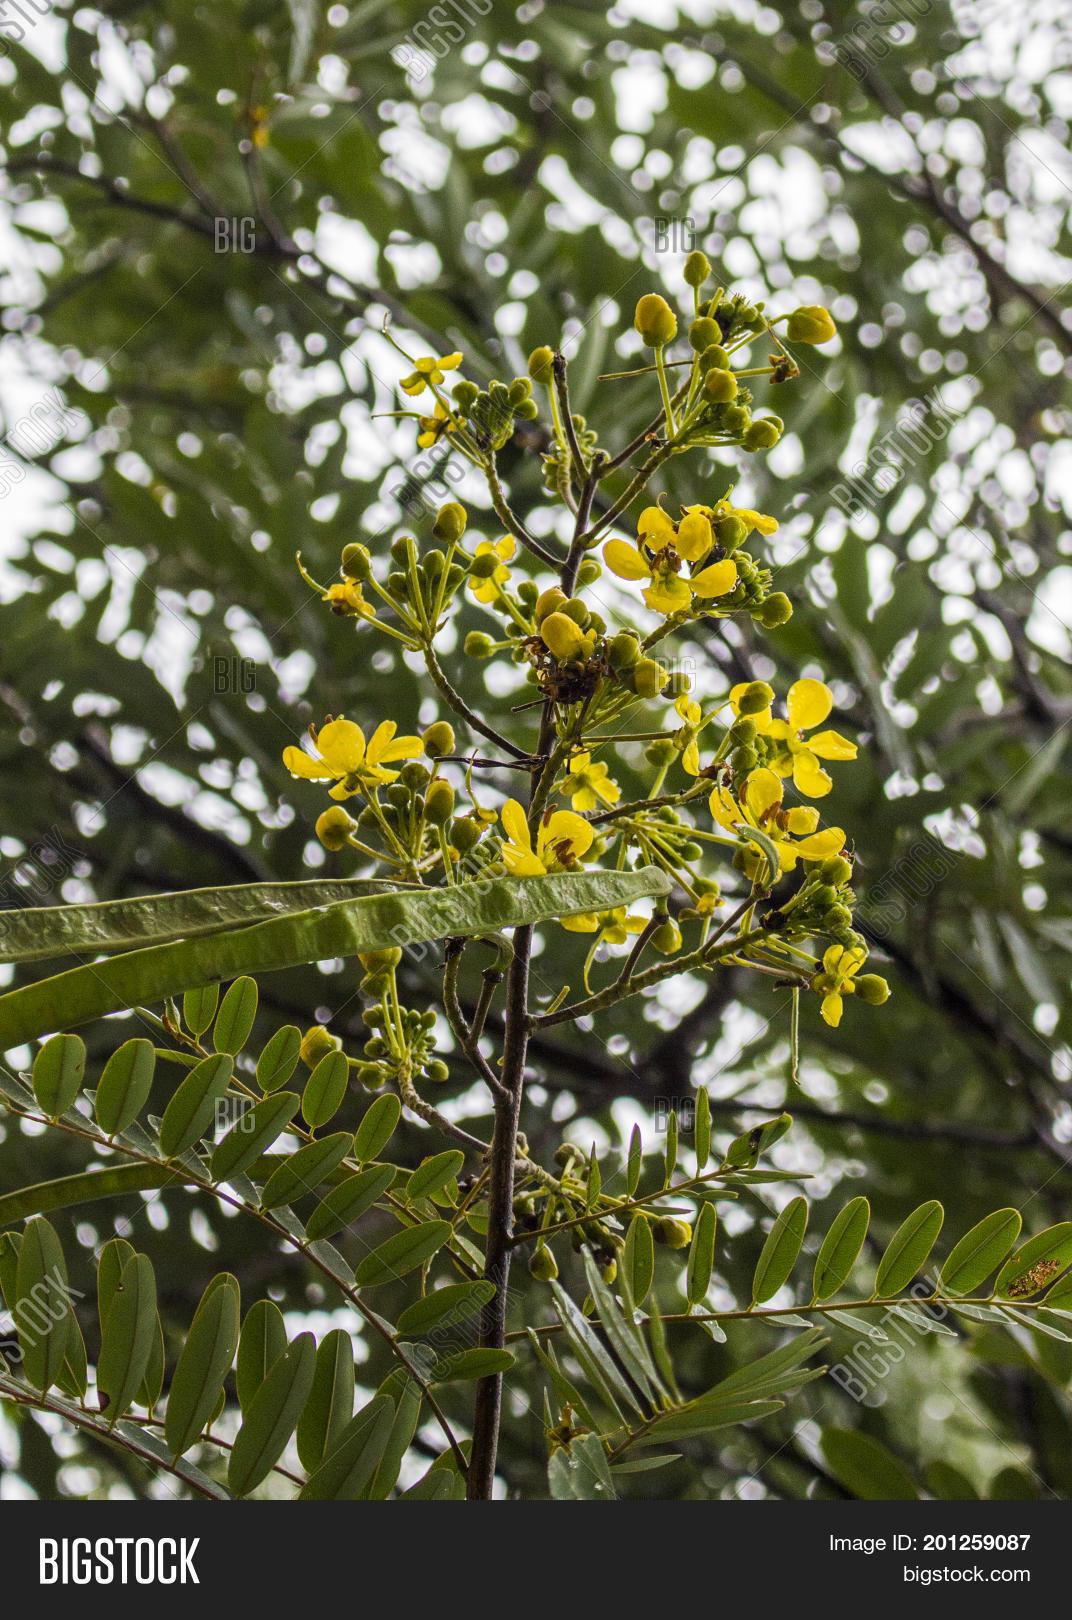 Yellow flower thai image photo free trial bigstock yellow flower of thai copper pod or siamese senna or siamese cassia or cassod tree and mightylinksfo